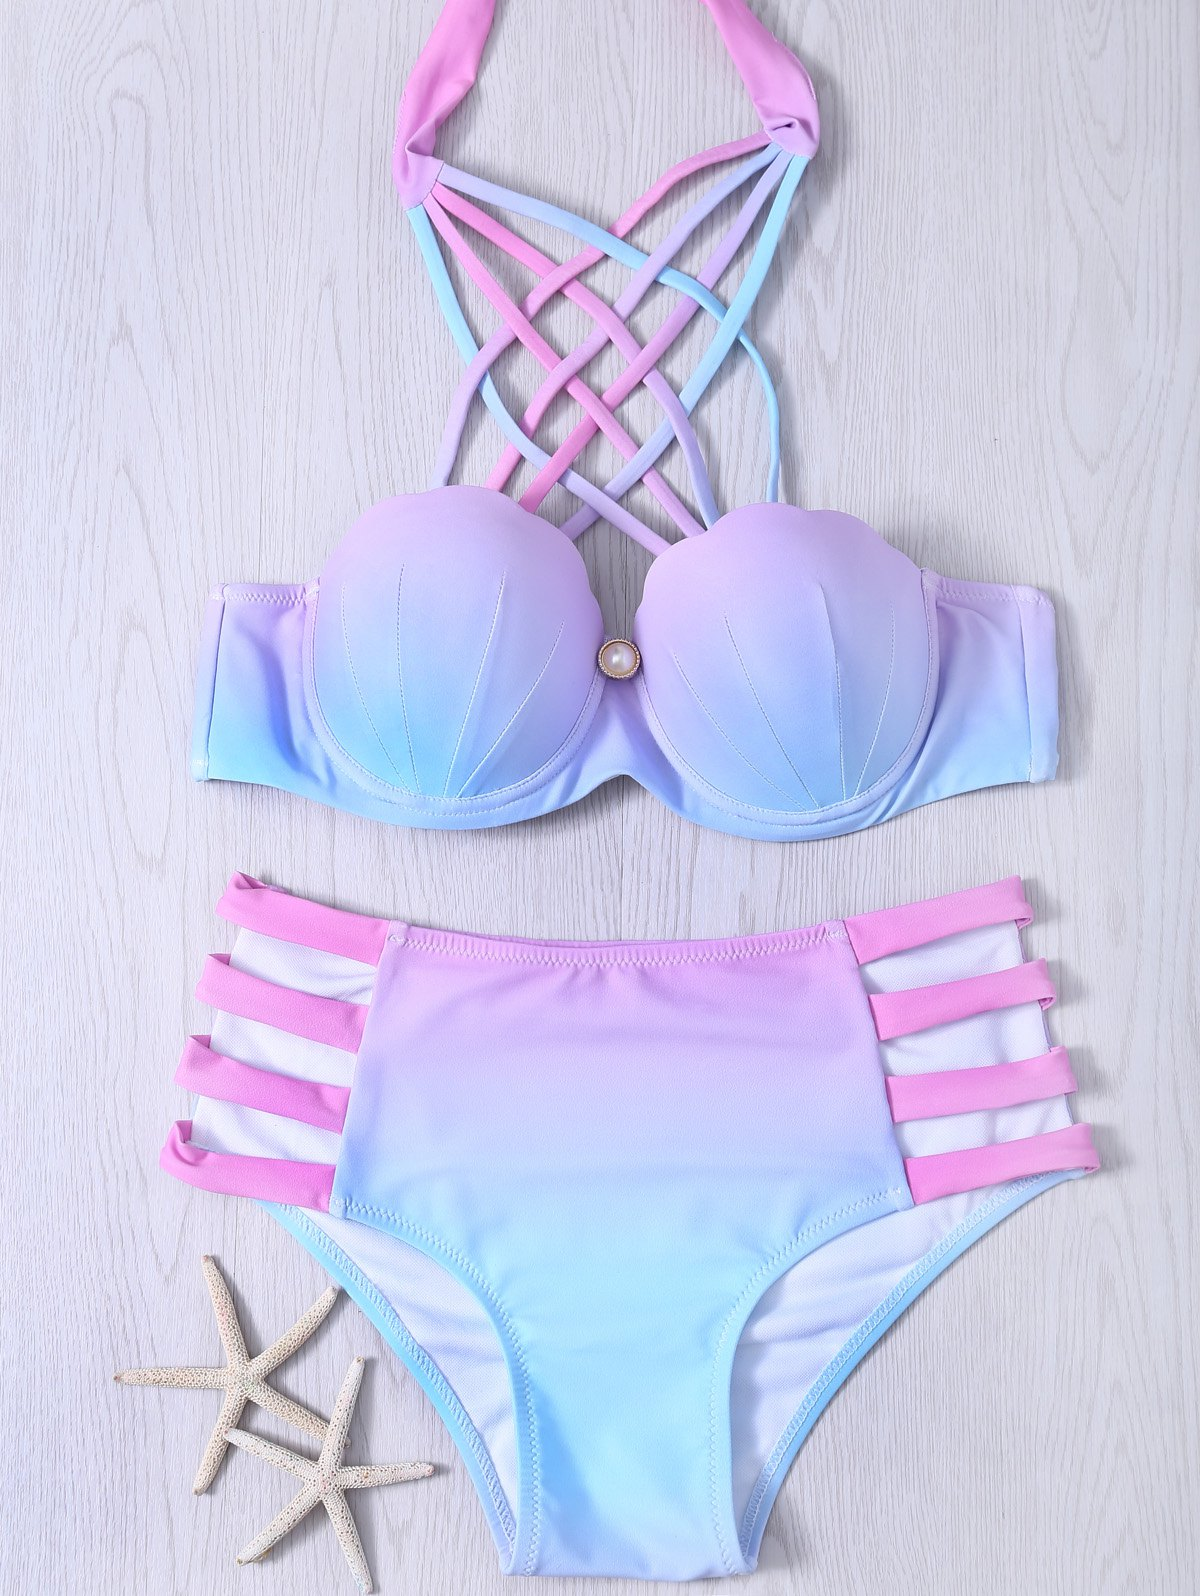 Lace-Up Hollow Out Gradient Bikini Set